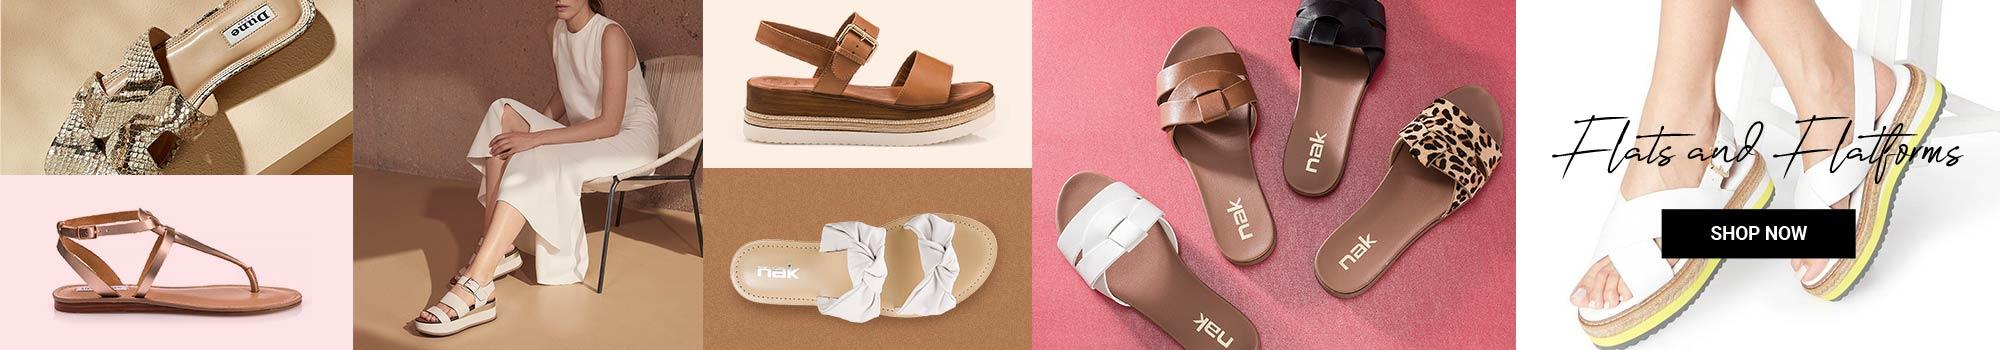 1b350b850b9 NAK Παπουτσια Online   Γυναικεία, Ανδρικά, Παιδικά Παπούτσια